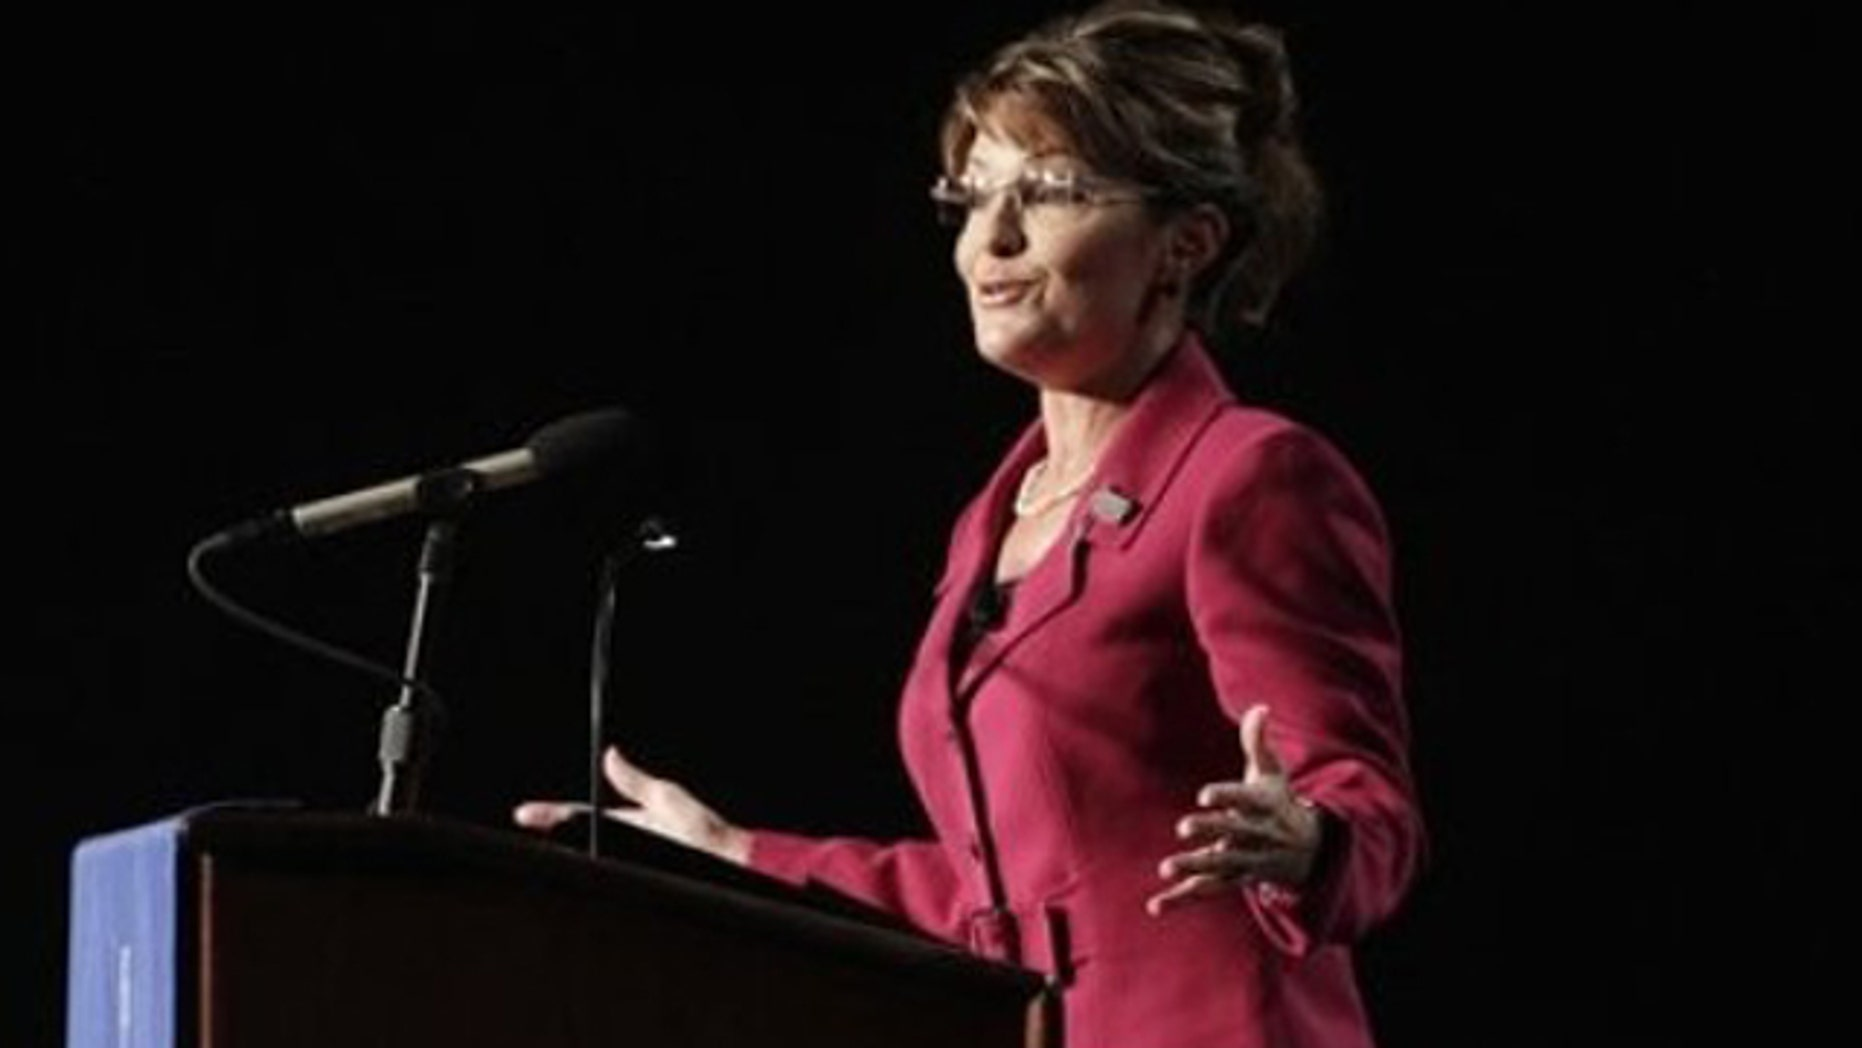 Oct. 7: Former Alaska Gov. Sarah Palin speaks at a benefit dinner for Faulkner University in Montgomery, Ala.